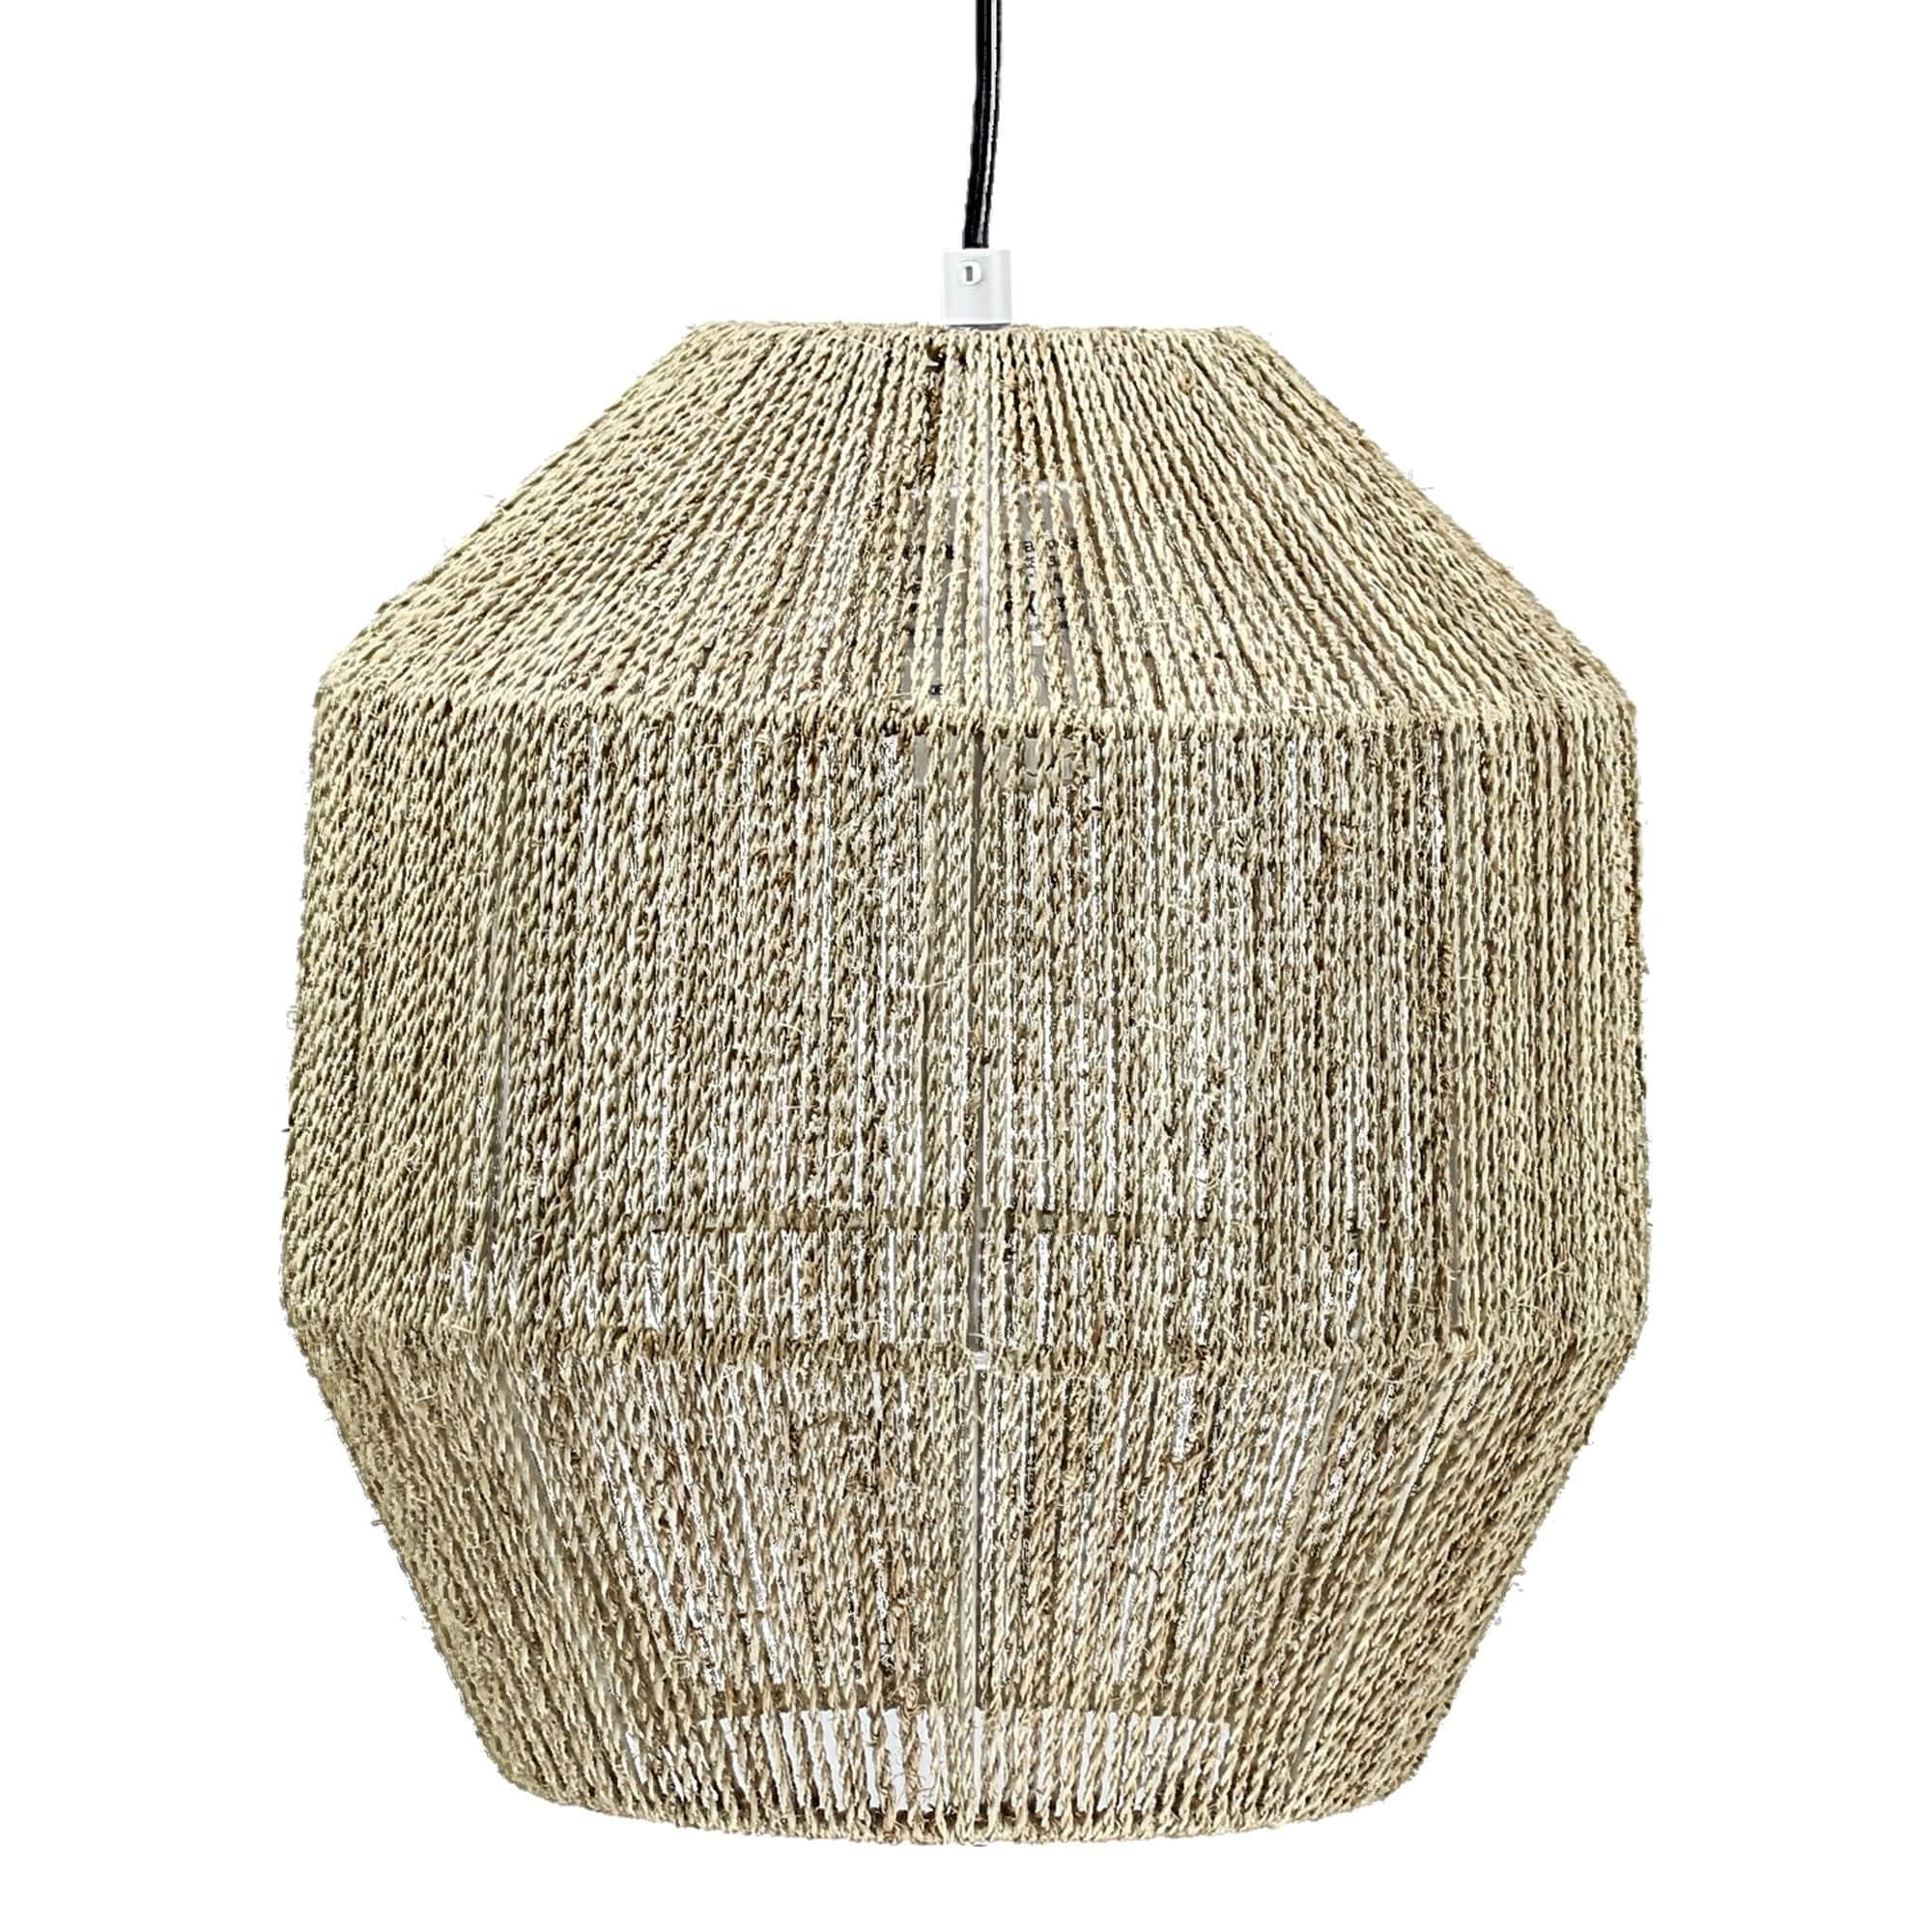 American Art Decor Swag Style Hemp Rope Hanging Pendant Lamp 12 5 Overstock 26274363